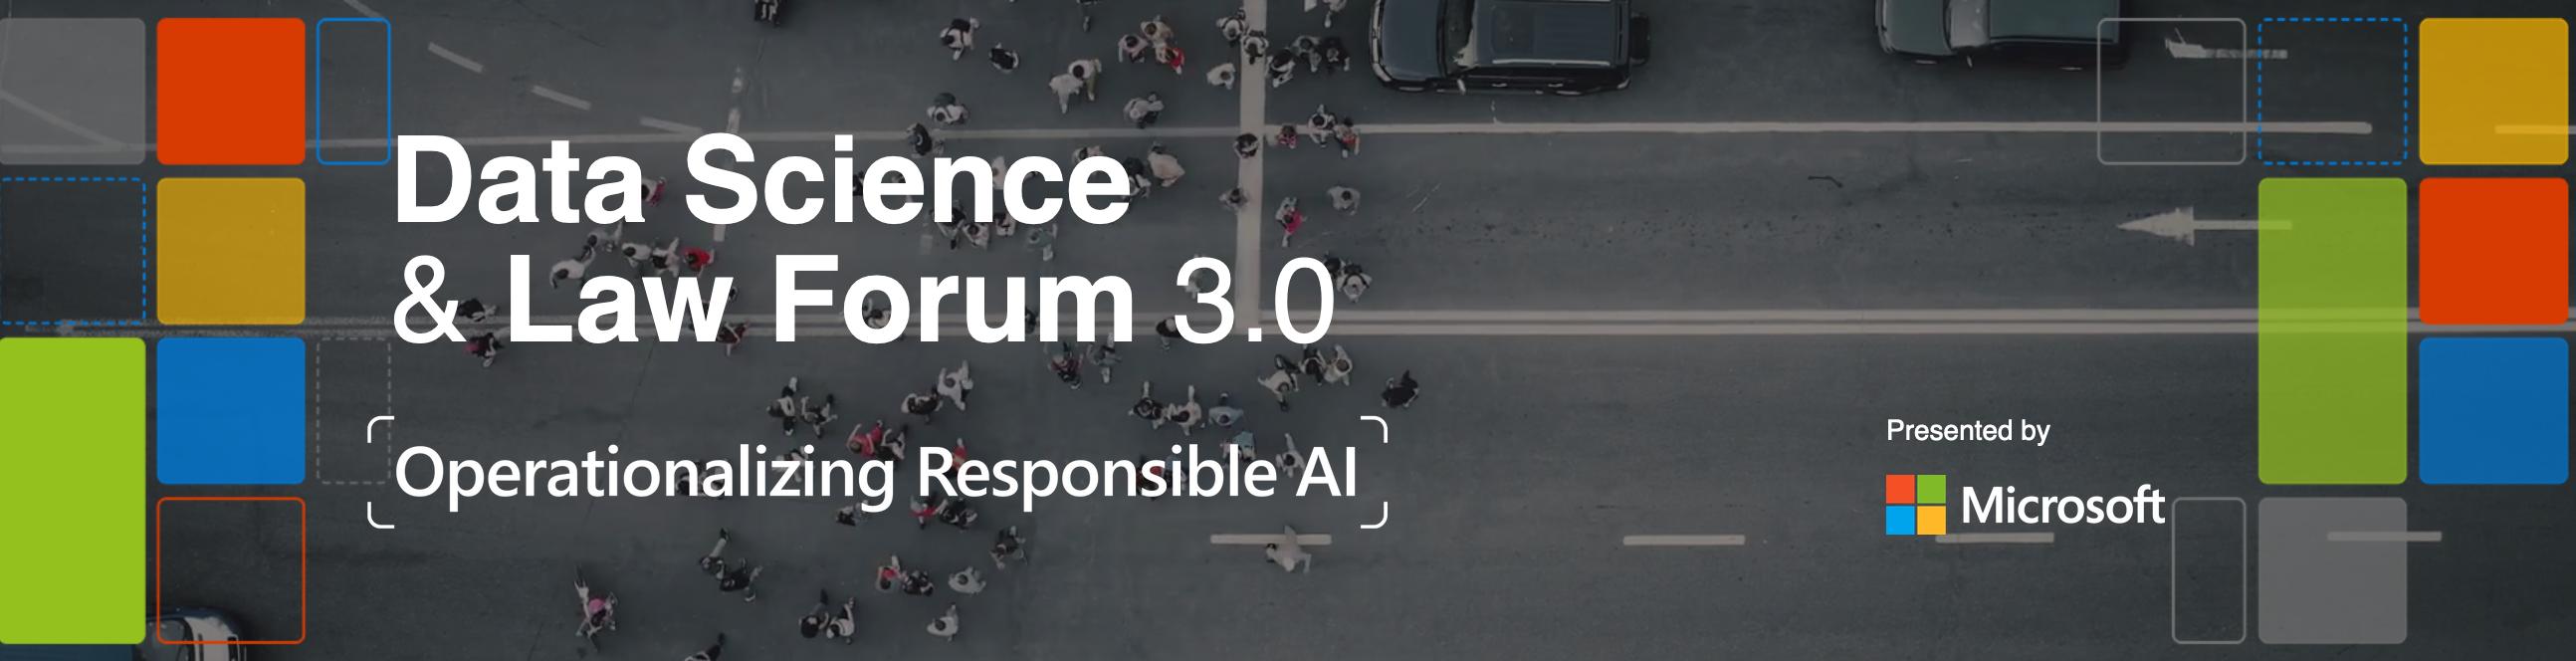 Microsoft and AI-Regulation Chair